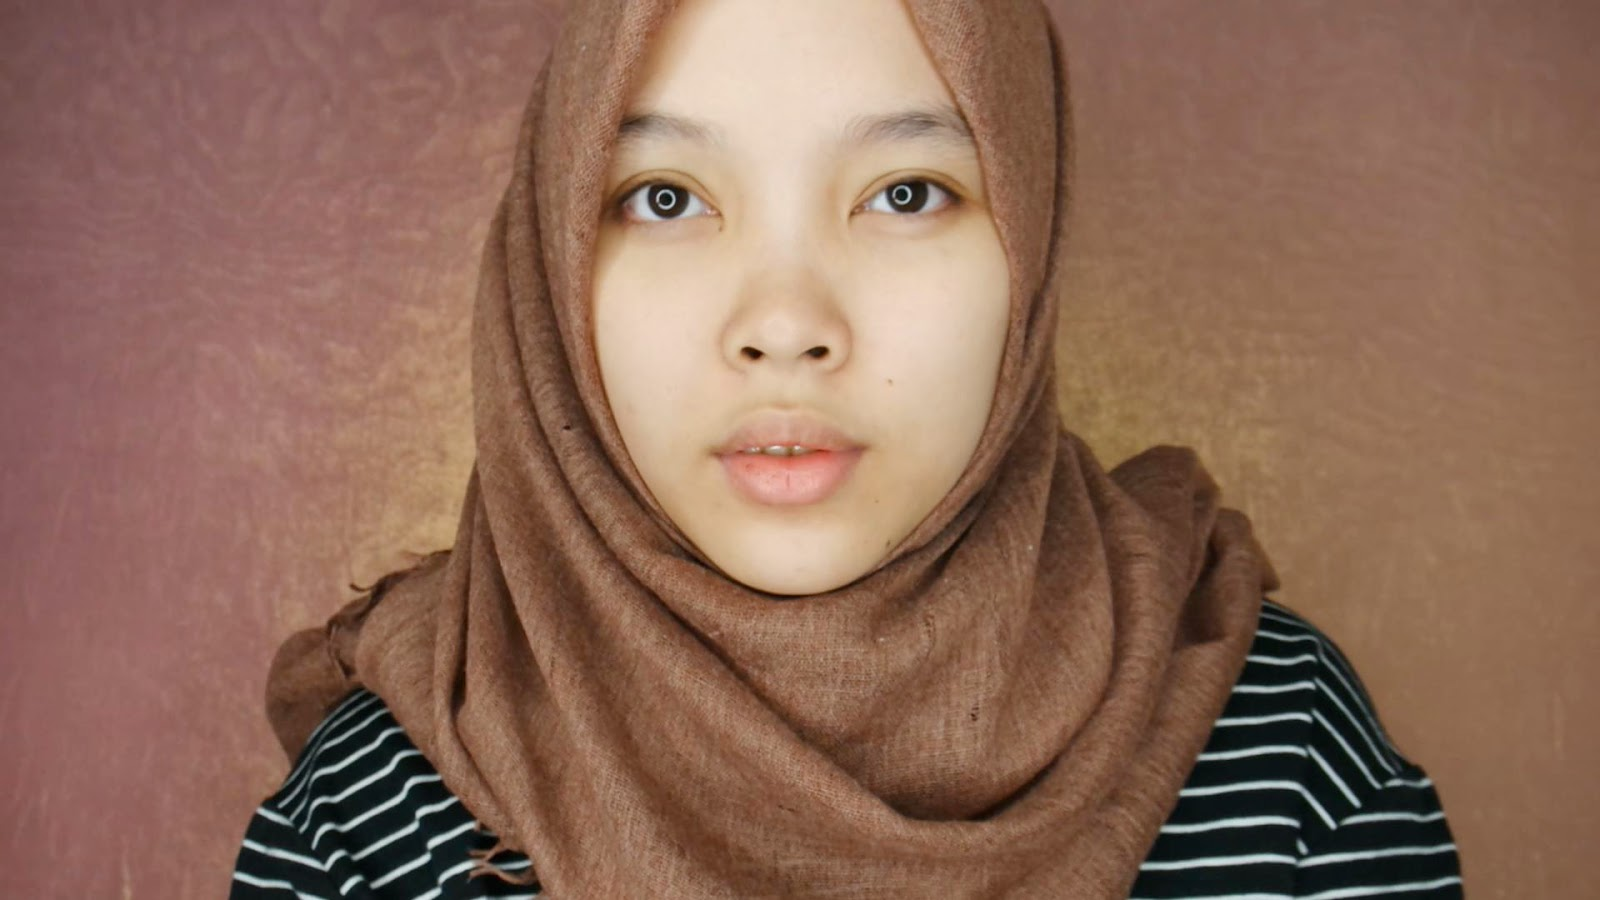 Haloterong By Mevlied Nahla Sp Sato Hakubi Bb Cream Q10 Pastaron Mungkin Rada Susah Sih Buat Yang Kulitnya Gelap Karena Cuma Ngeluarin 1 Shade